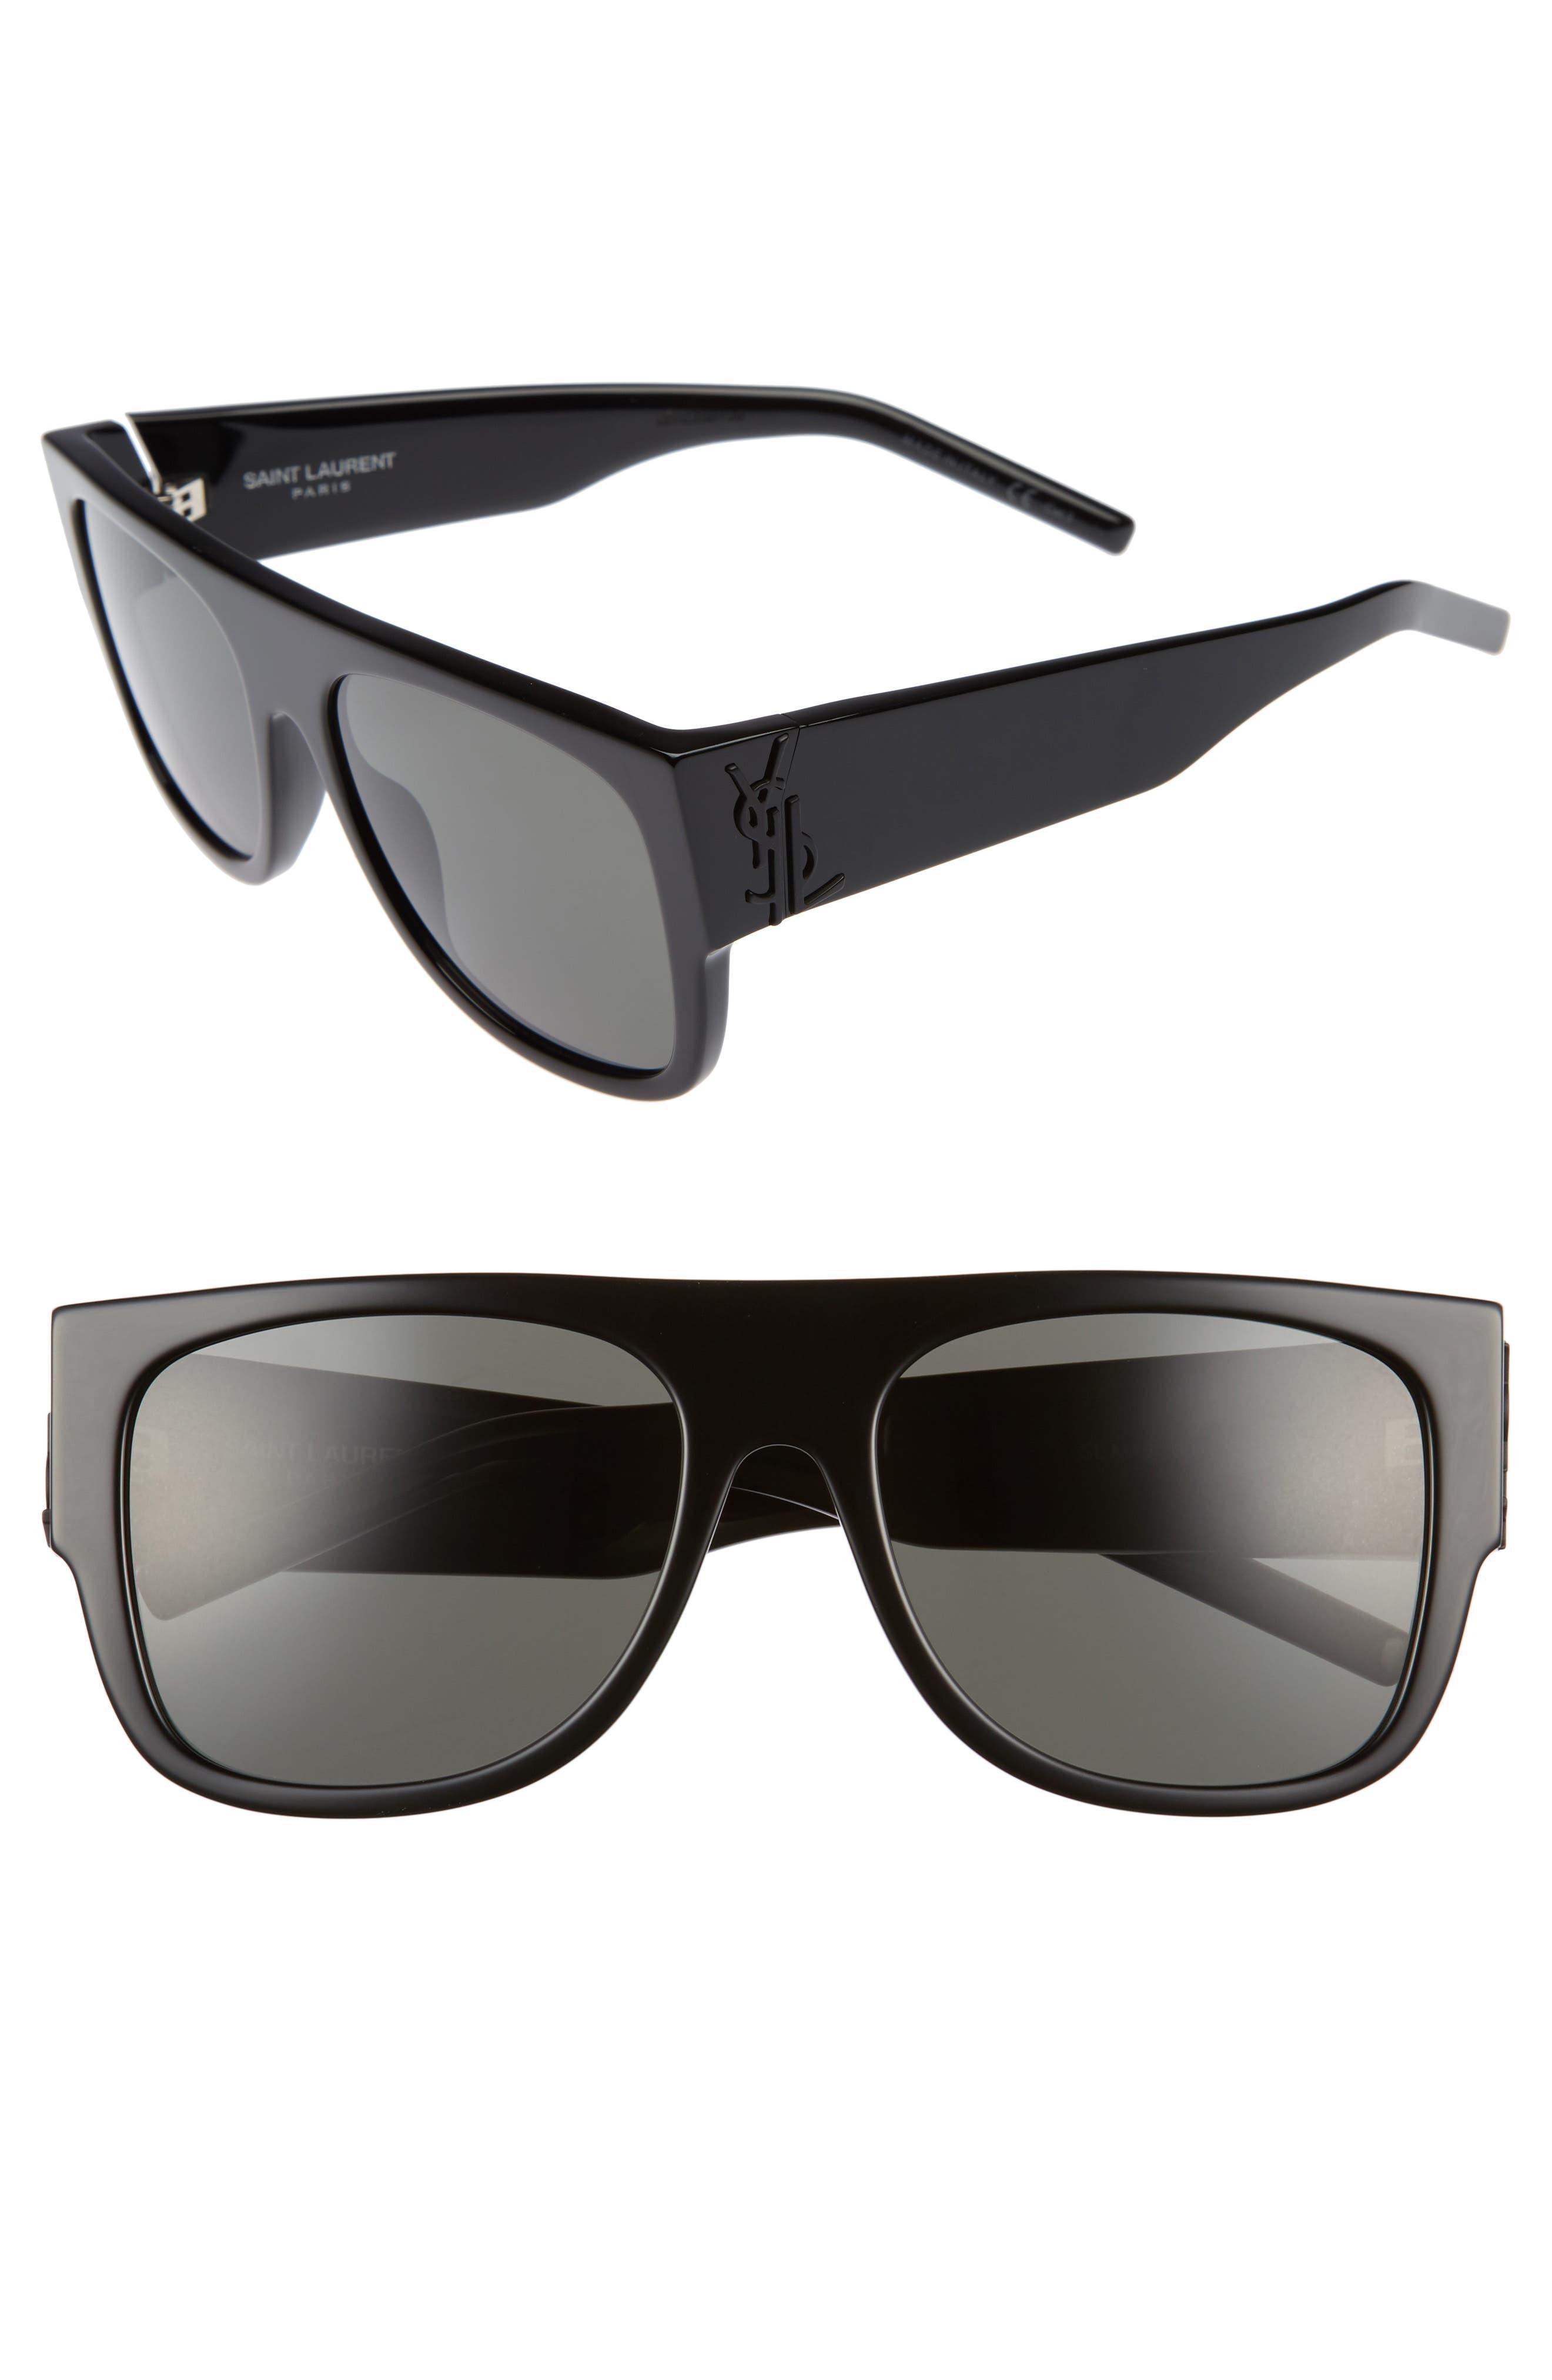 Main Image - Saint Laurent SL M16 55mm Flat Top Sunglasses